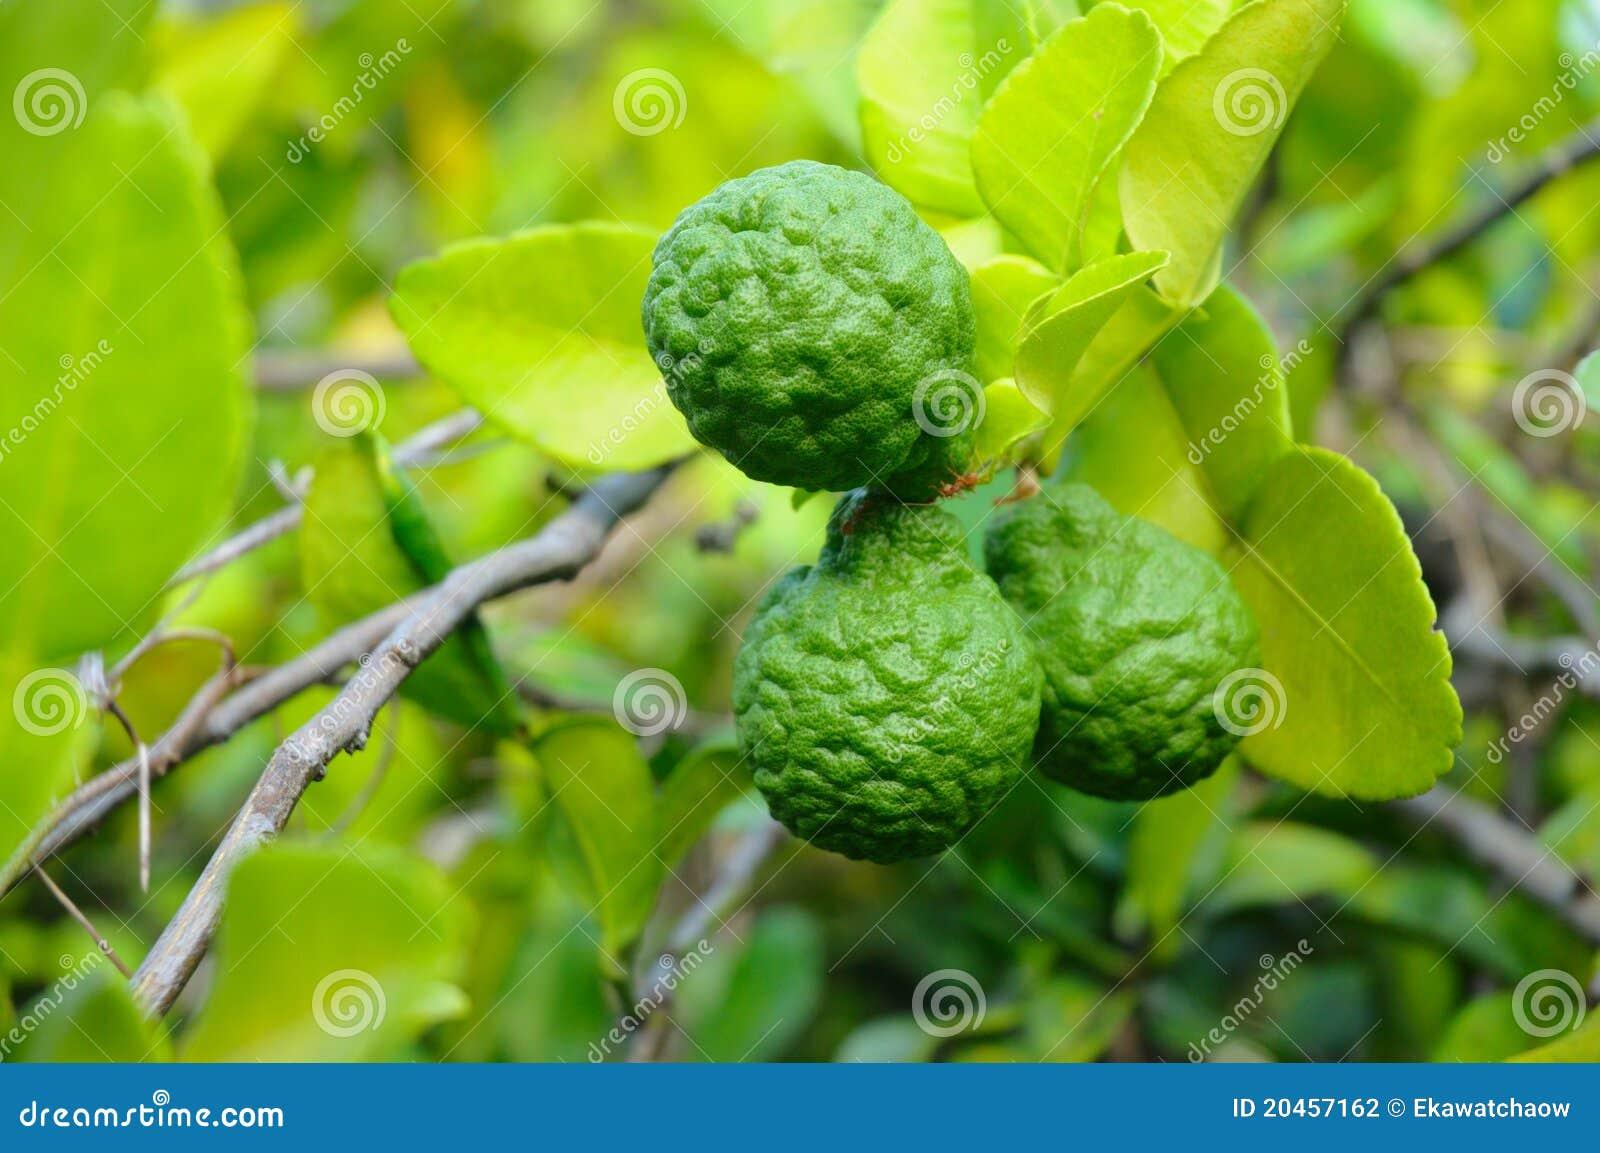 Three Leech Lime Fruits Stock Photography - Image: 20457162 Leeches Fruit Tree